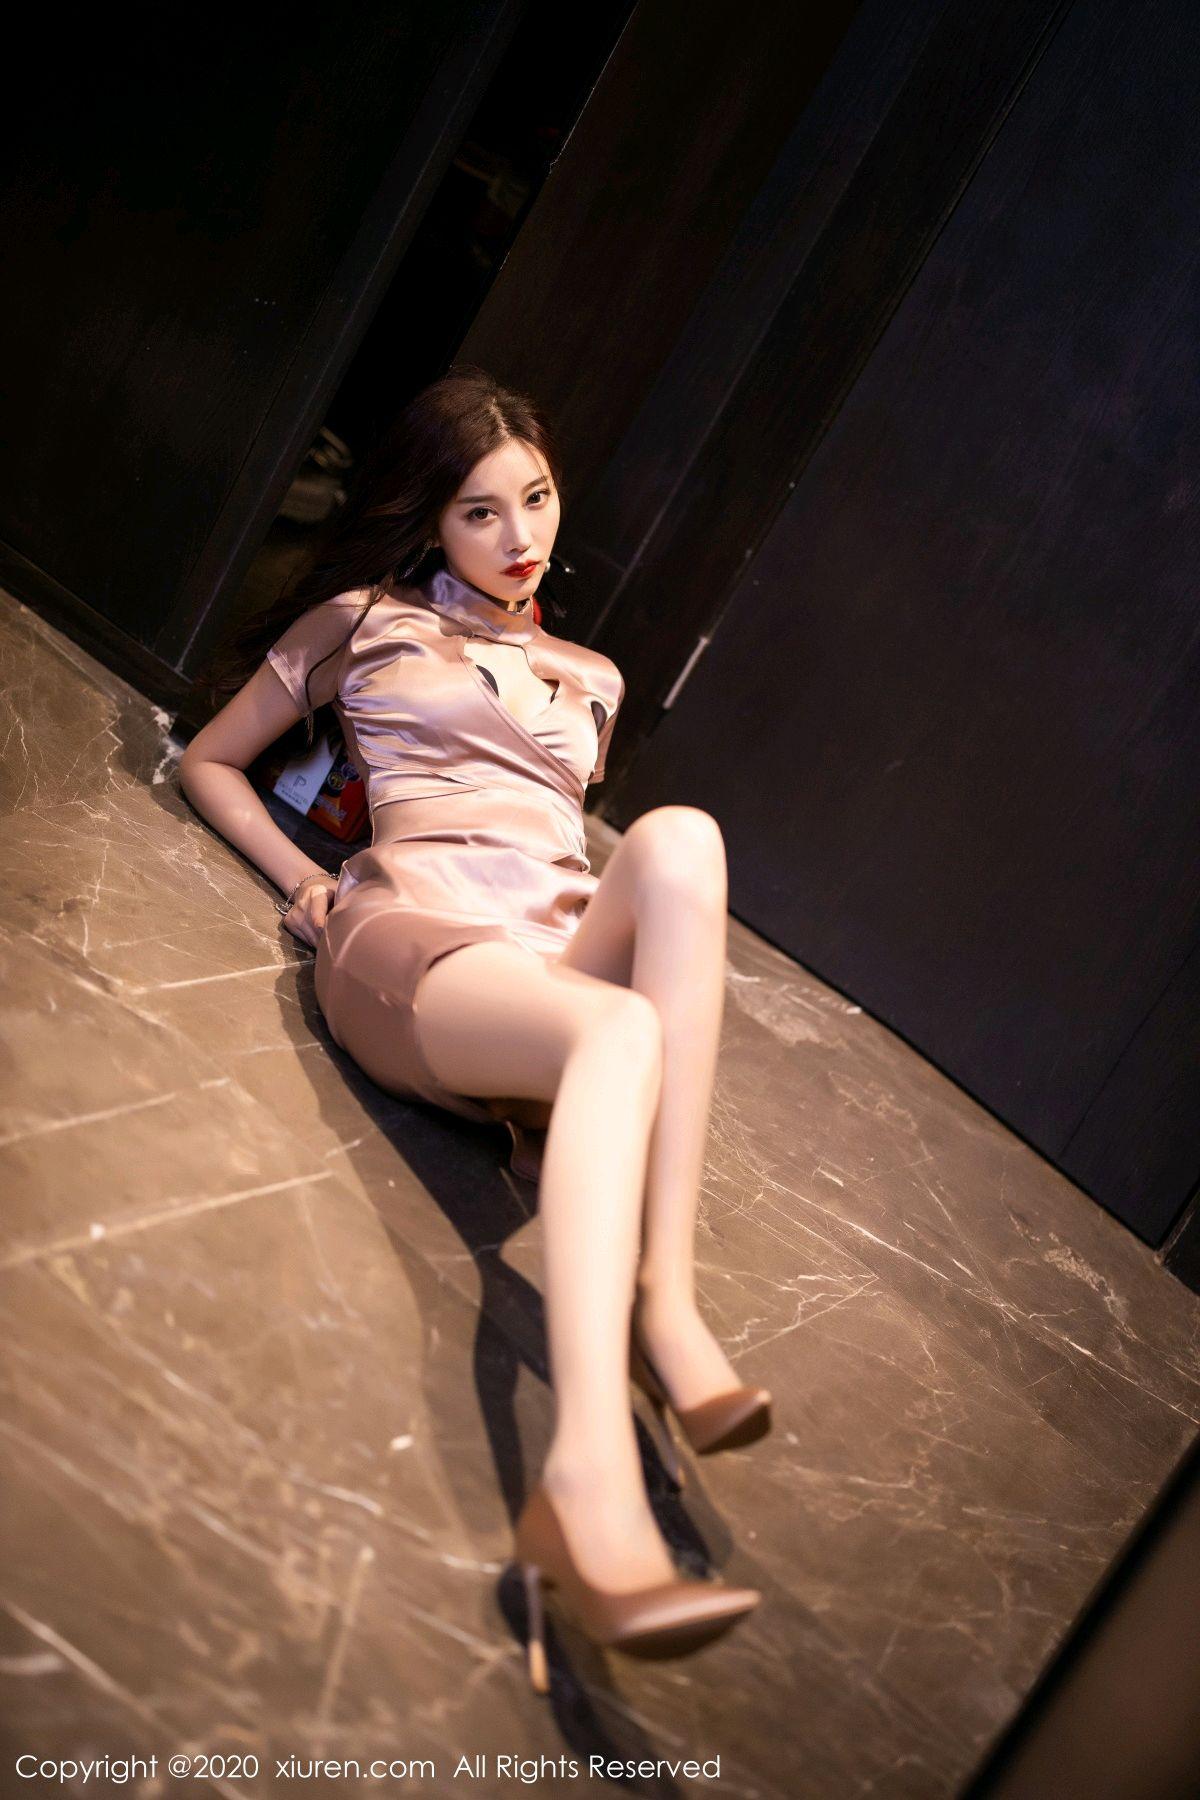 [XiuRen] Vol.2587 Yang Chen Chen 52P, Underwear, Xiuren, Yang Chen Chen